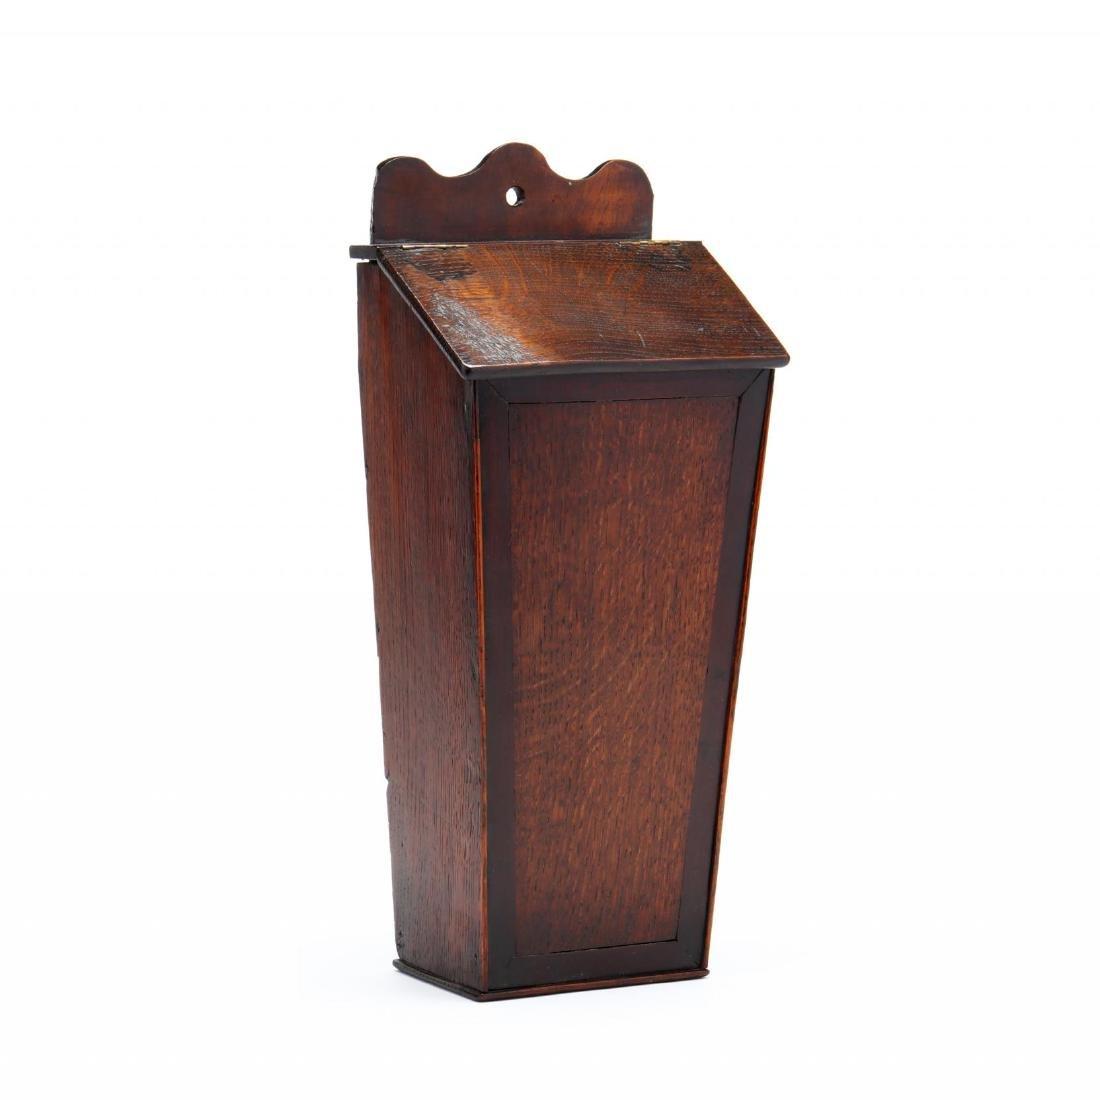 An Antique English Oak Candlebox